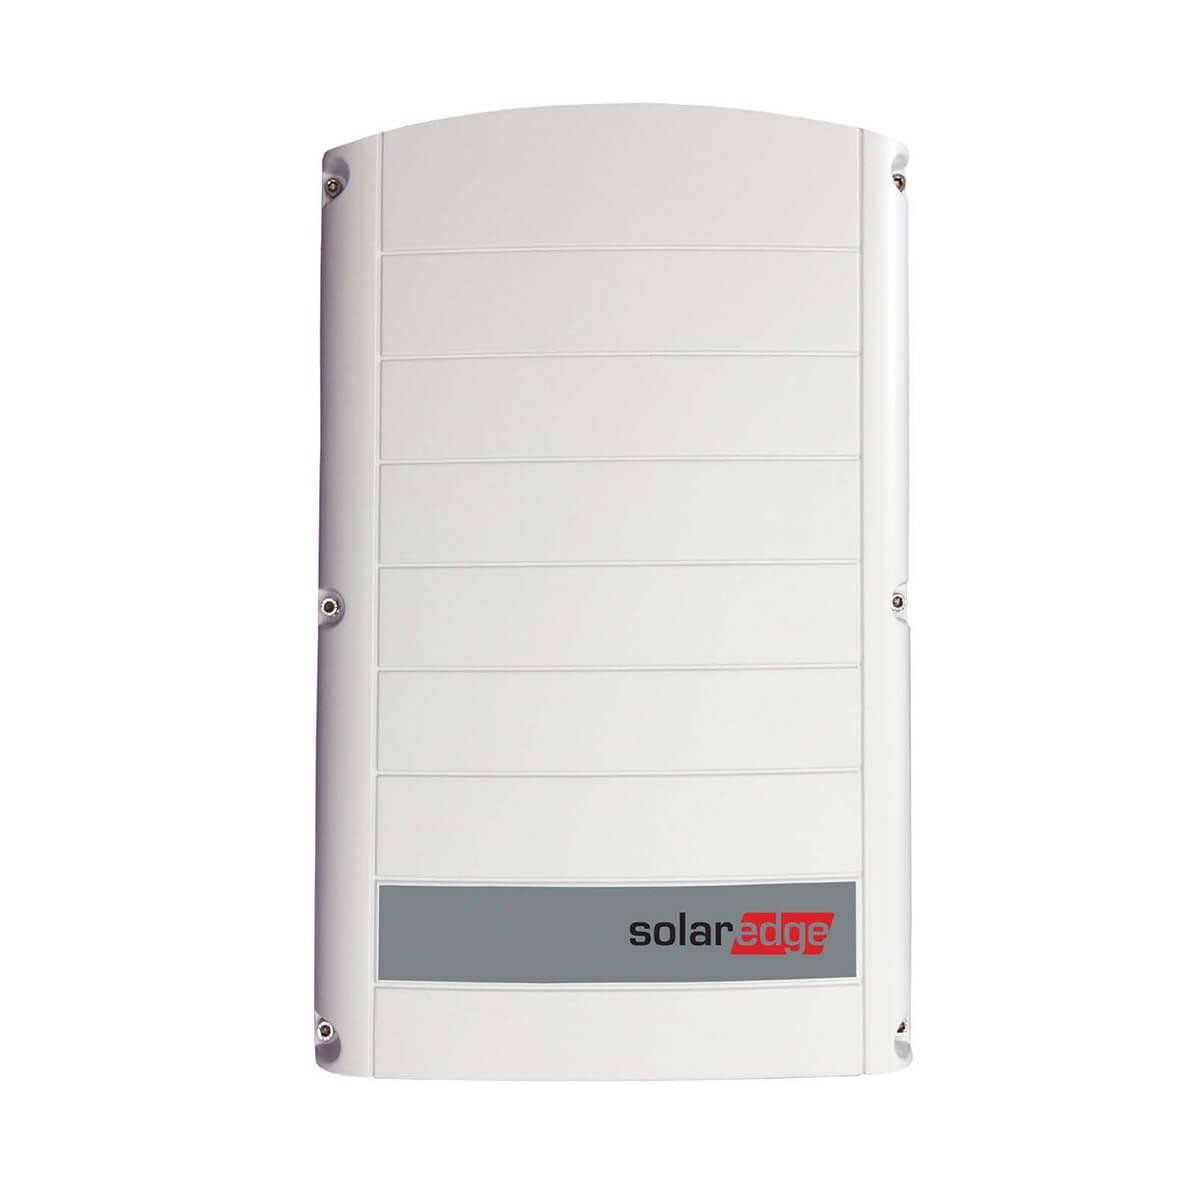 solaredge 40kW inverter, solaredge se40k 40kW inverter, solaredge se40k inverter, solaredge se40k, solaredge 40 kW